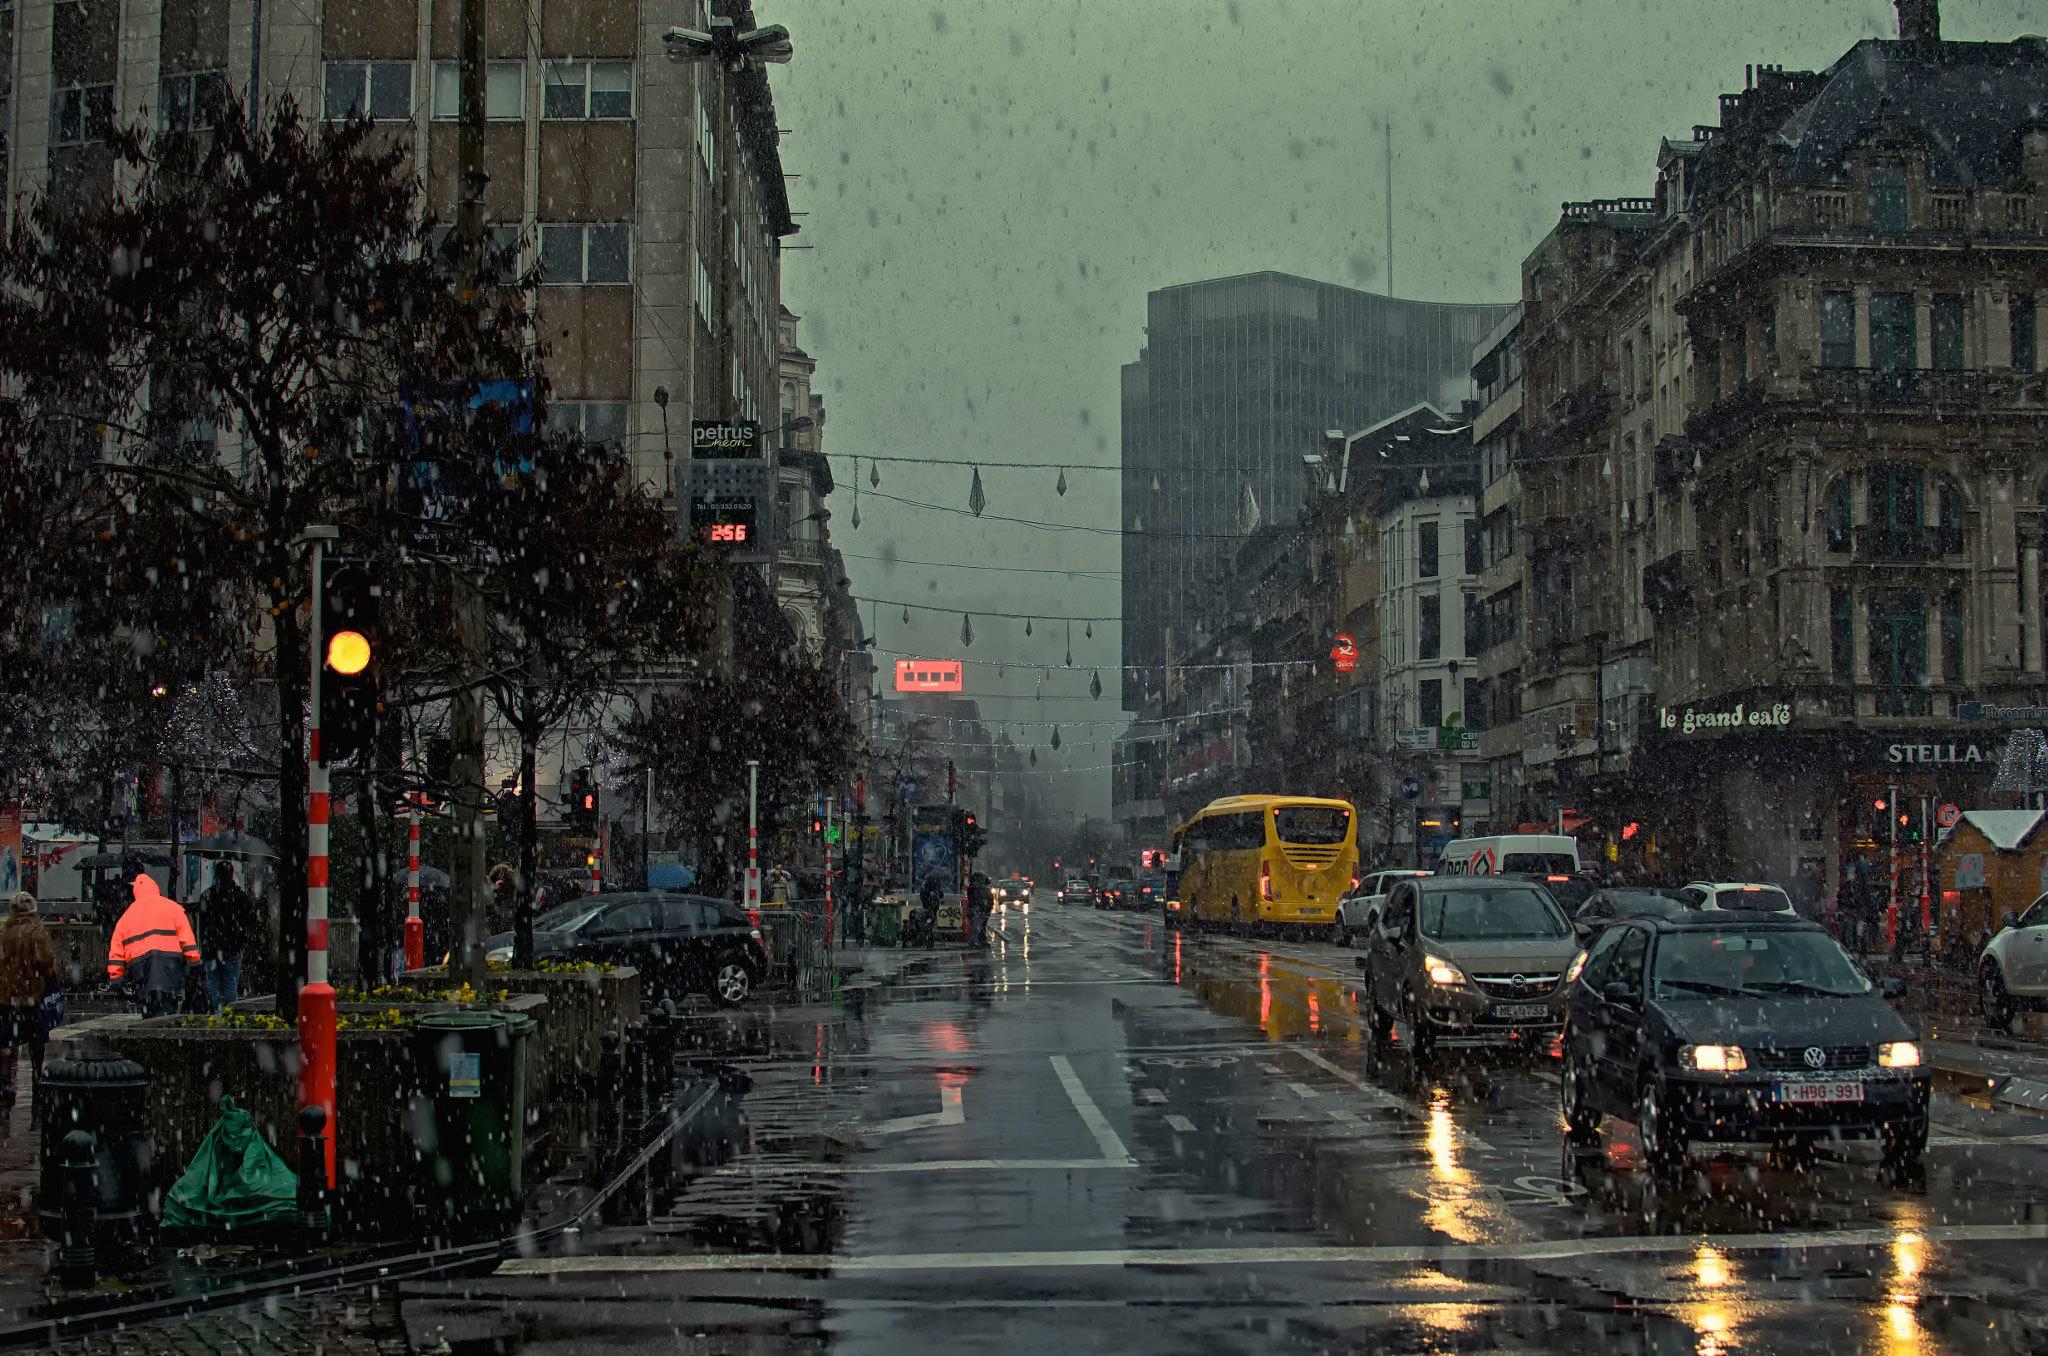 [74+] Rain Wallpaper Hd on WallpaperSafari